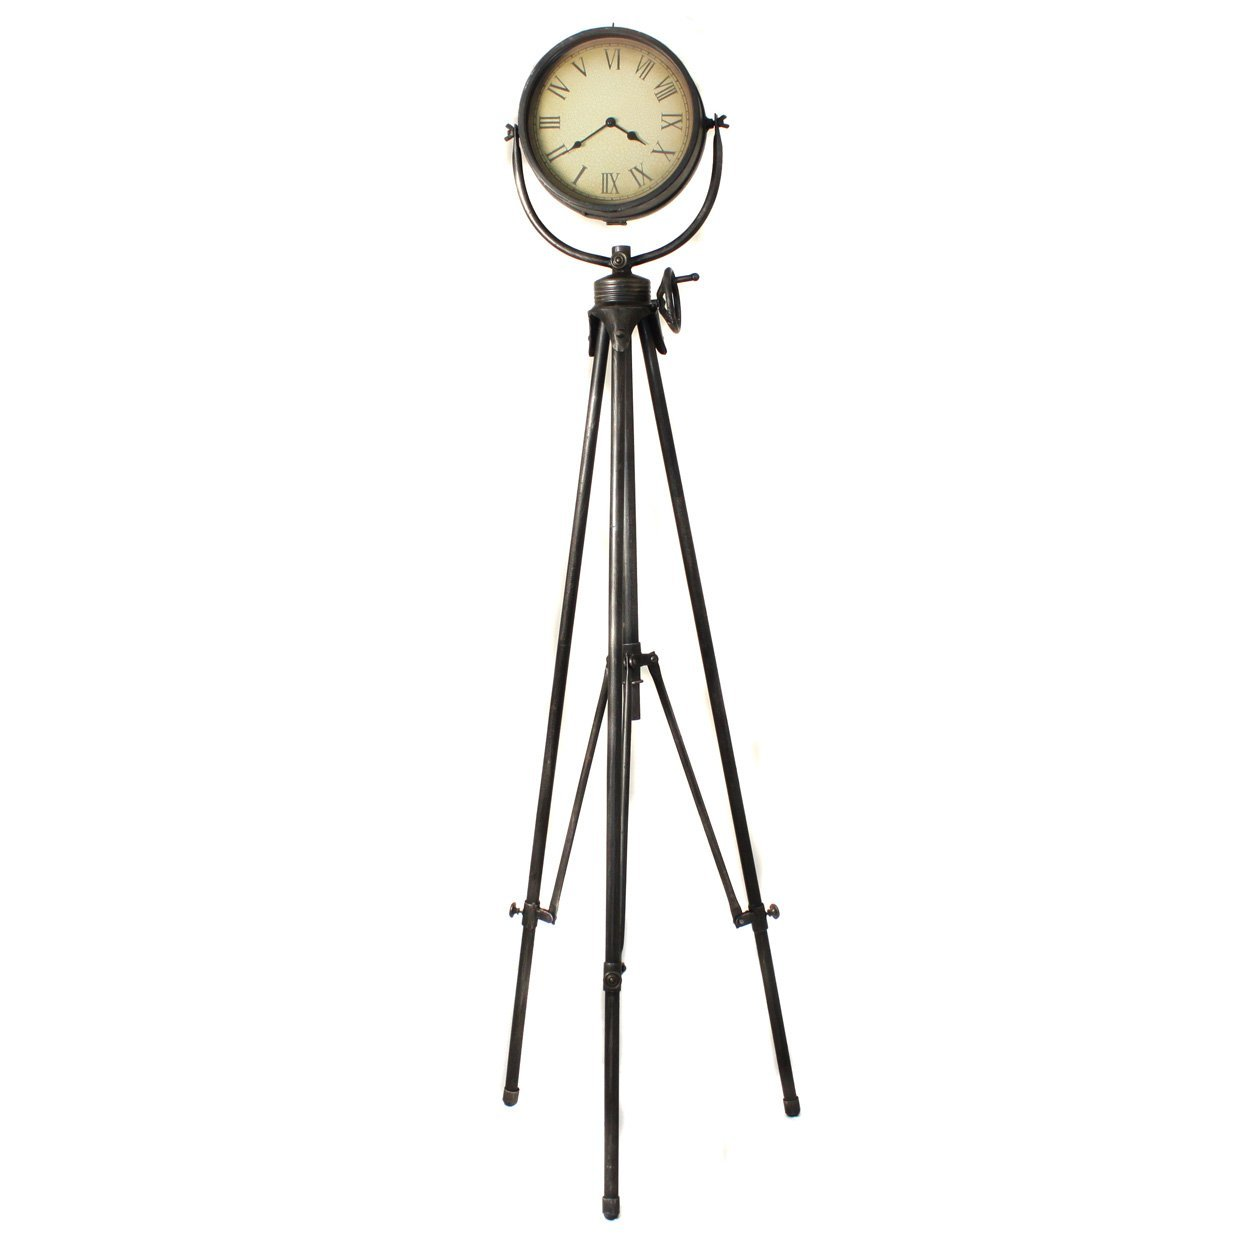 Urban Designs Large Weathered Industrial Studio Tripod Floor Clock